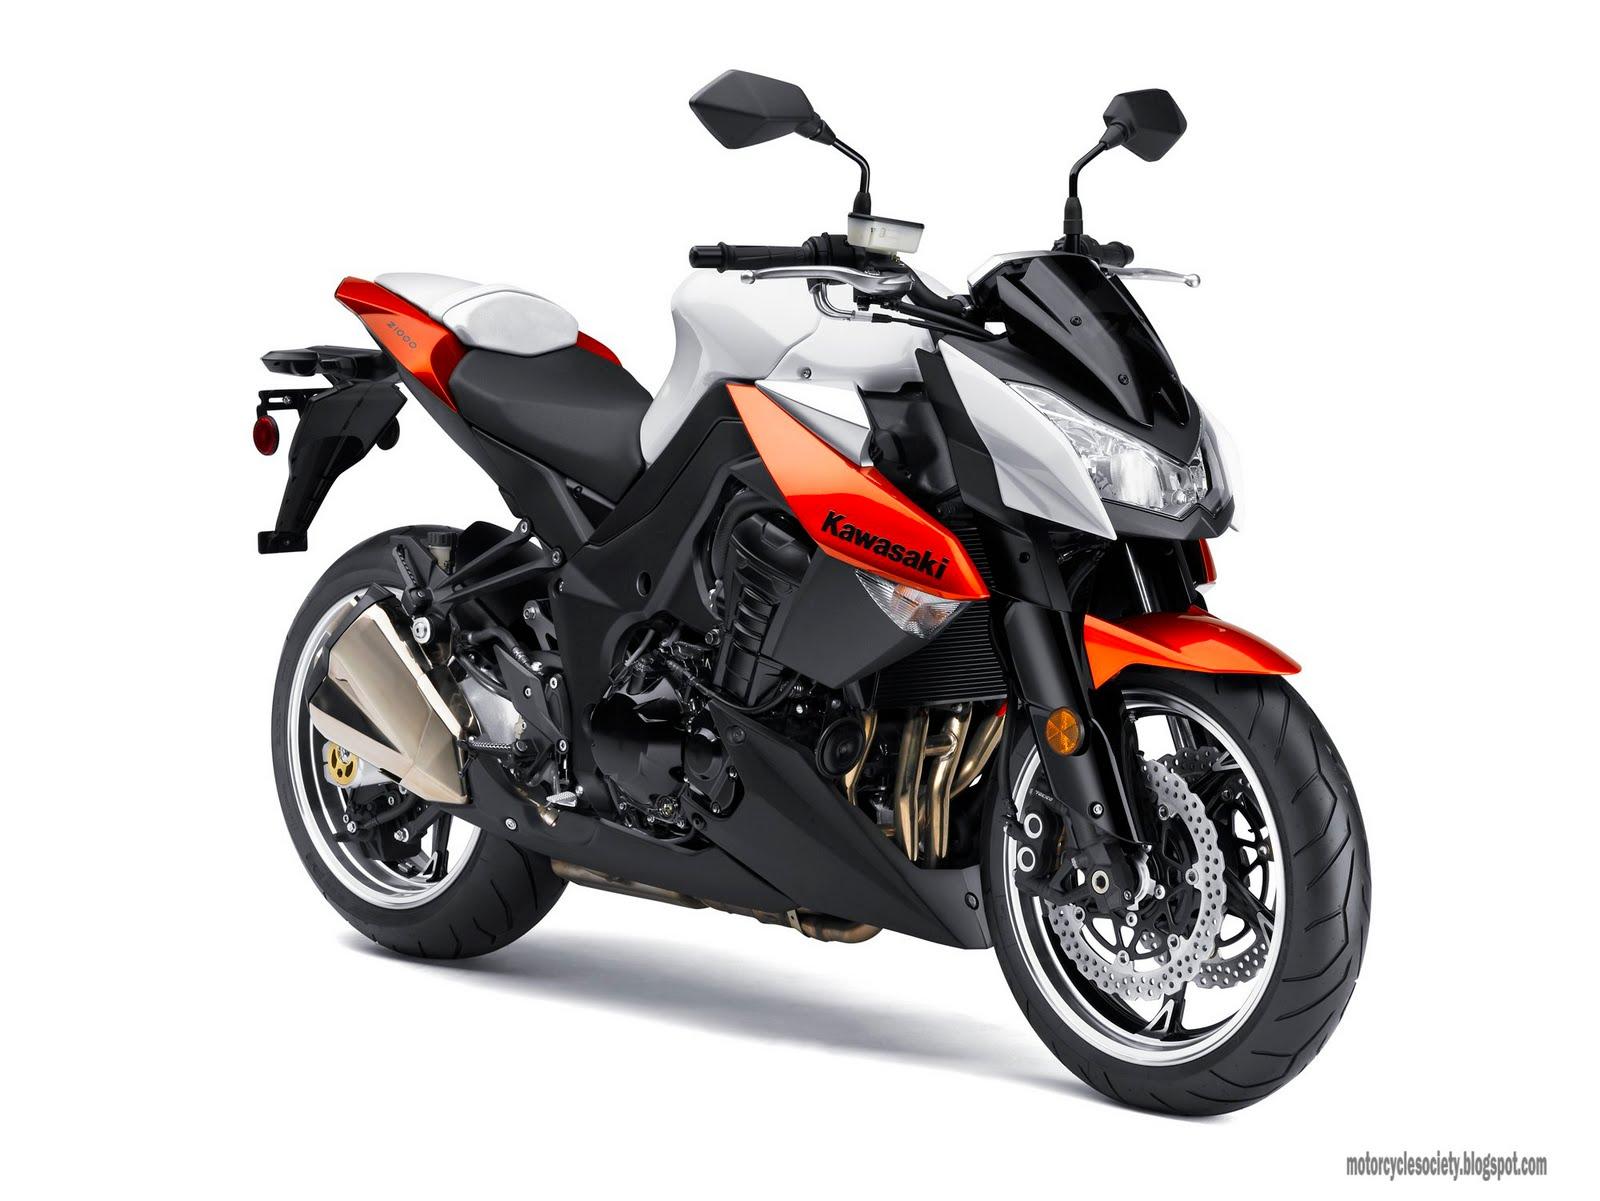 2010 Kawasaki Z1000br sportier than ever   Bikes